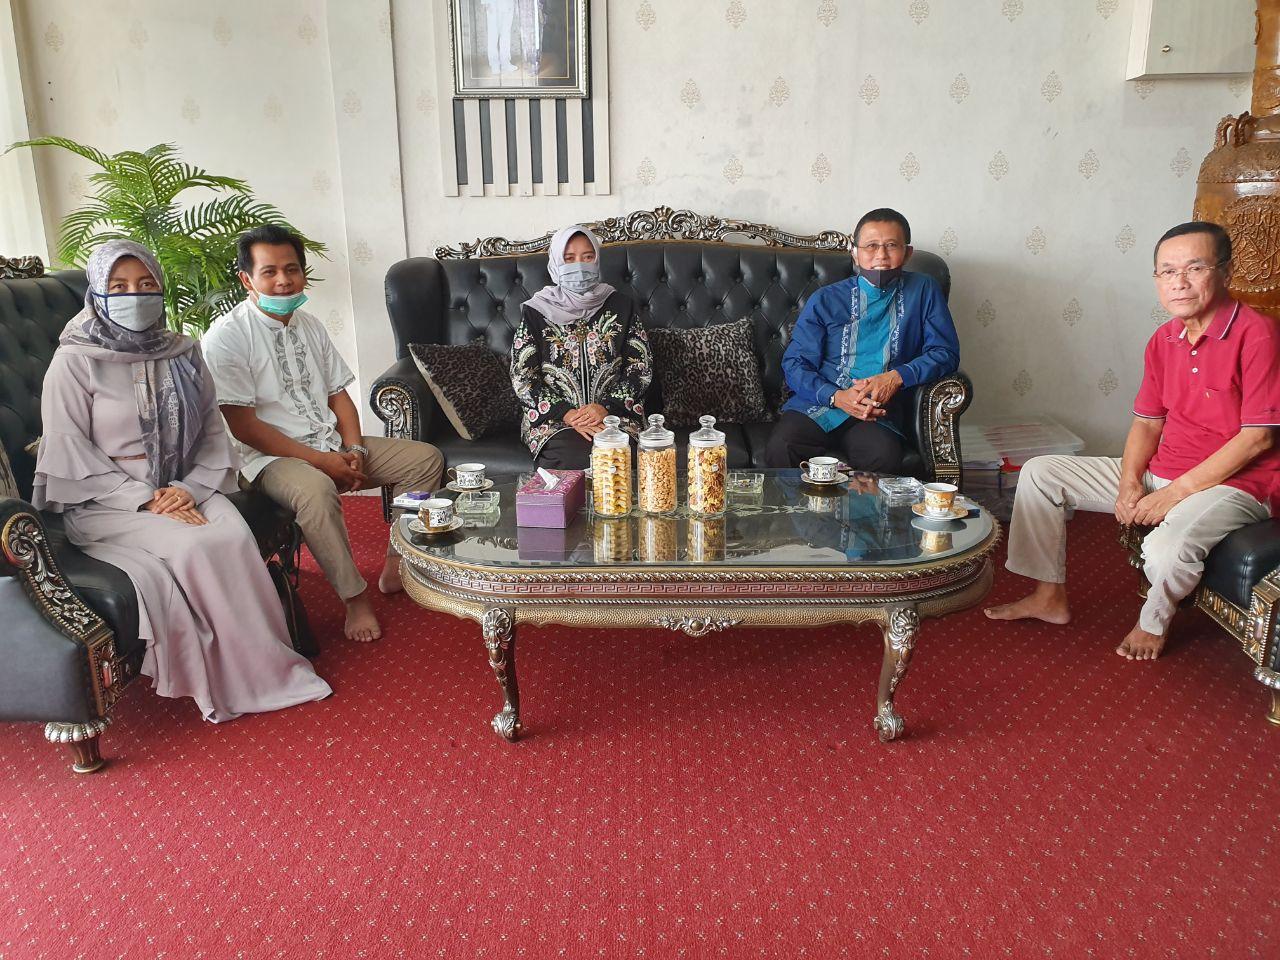 Bupati Ciamis Herdiat Sunarya, Jadikan Idul Fitri sebagai Momen Silaturahmi dengan Mantan Bupati Ciamis periode 2014-2019